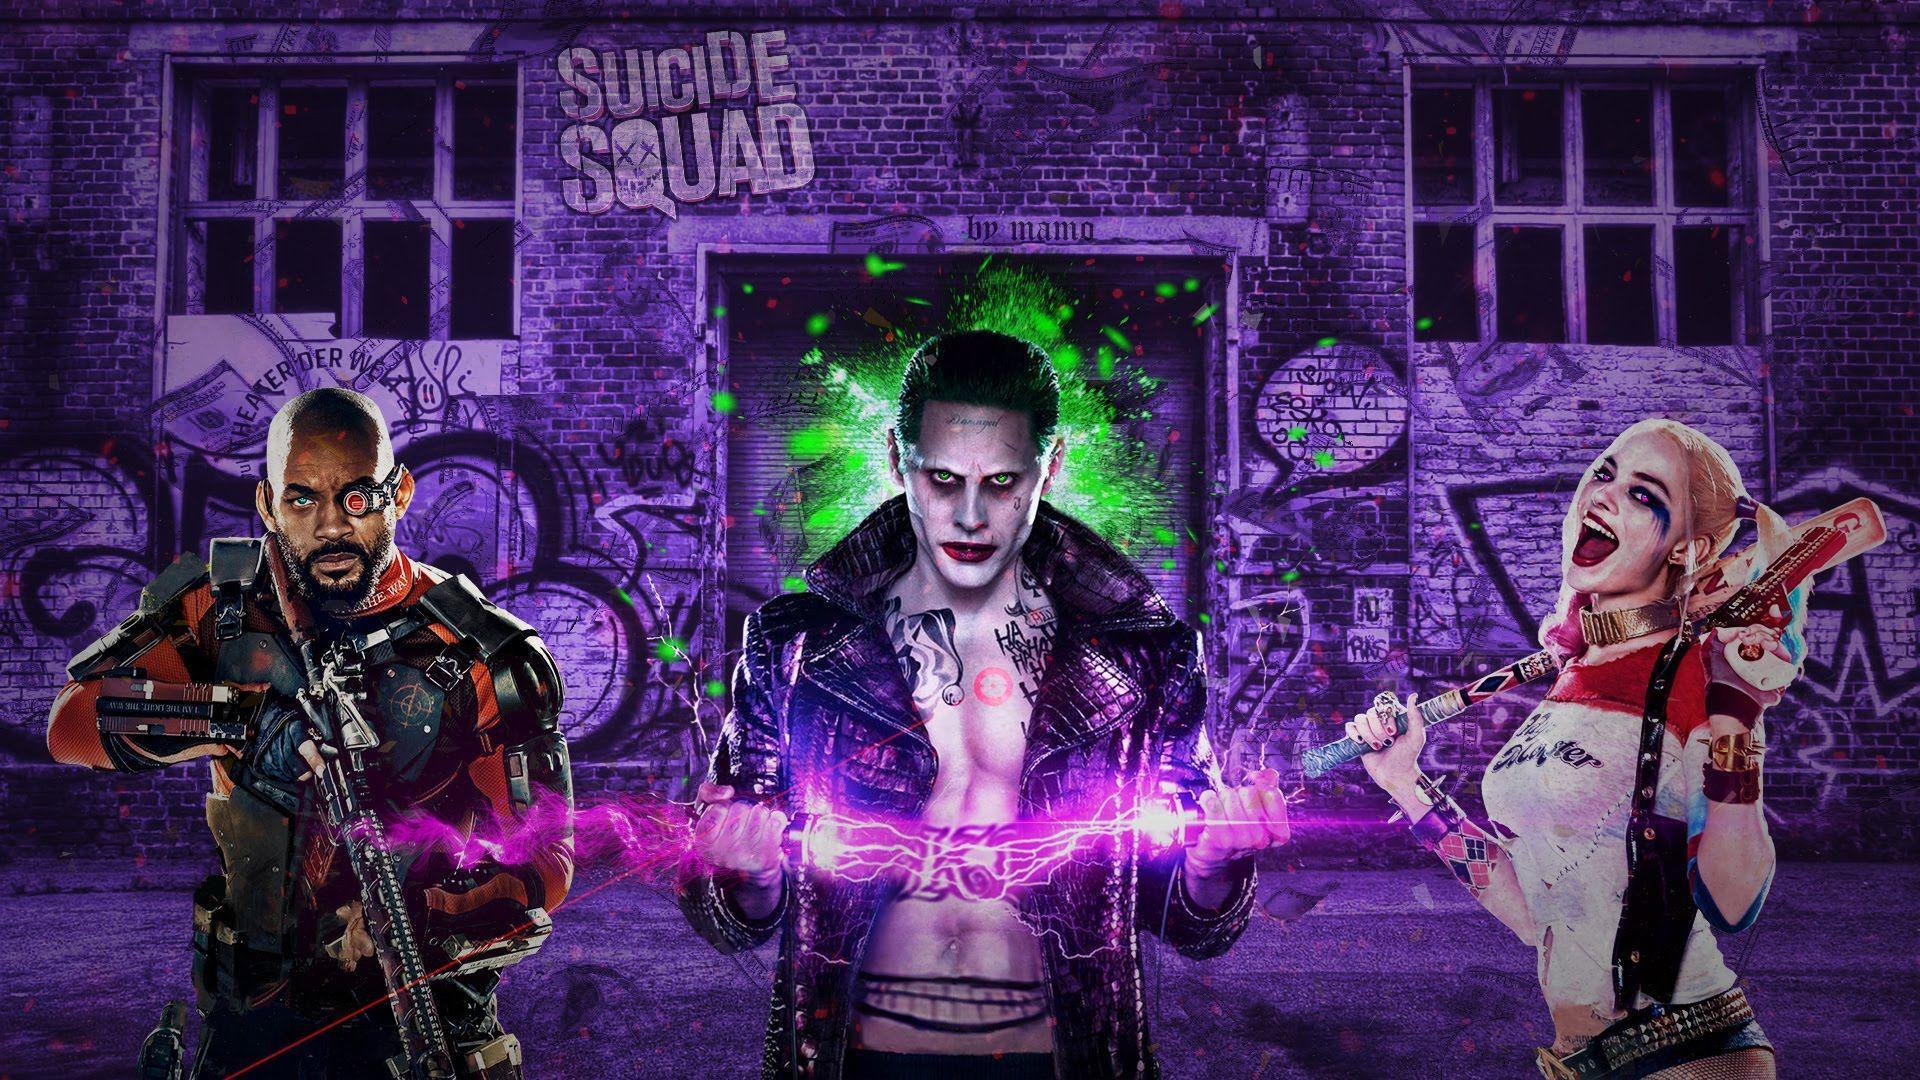 Suicide Squad 4k Wallpapers Top Free Suicide Squad 4k Backgrounds